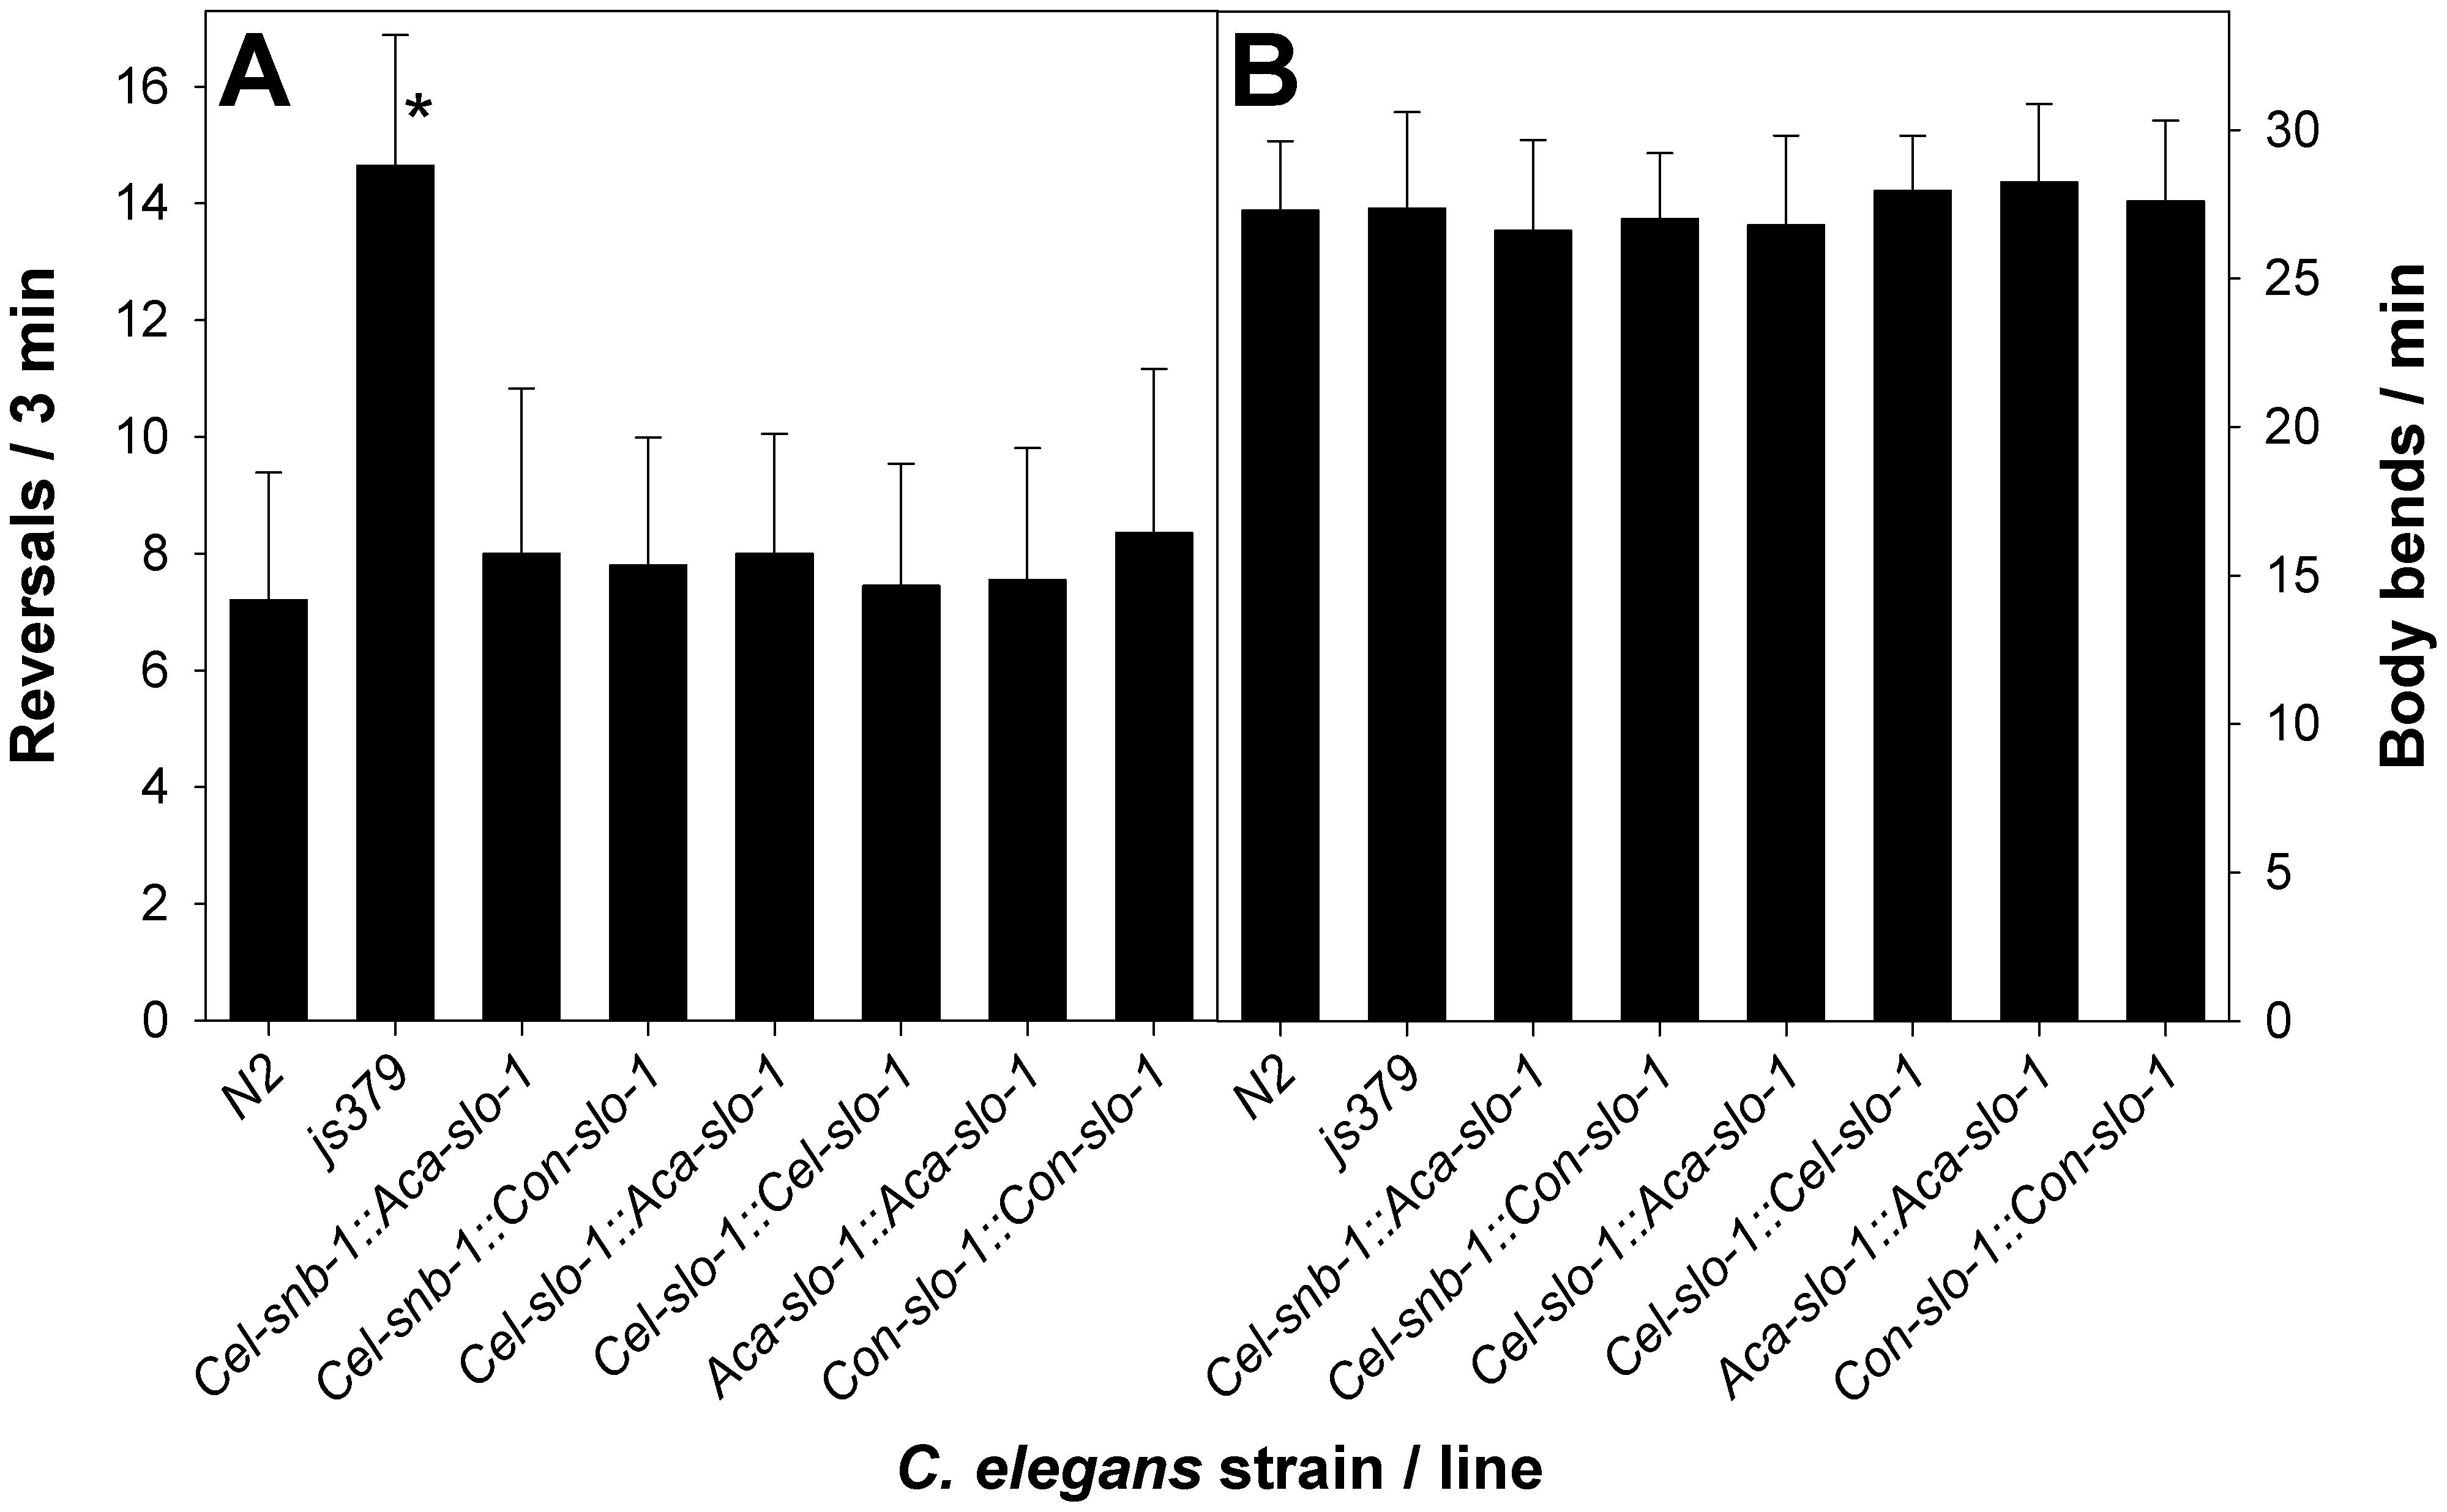 Behavioural phenotype of transgenic <i>C. elegans</i>.